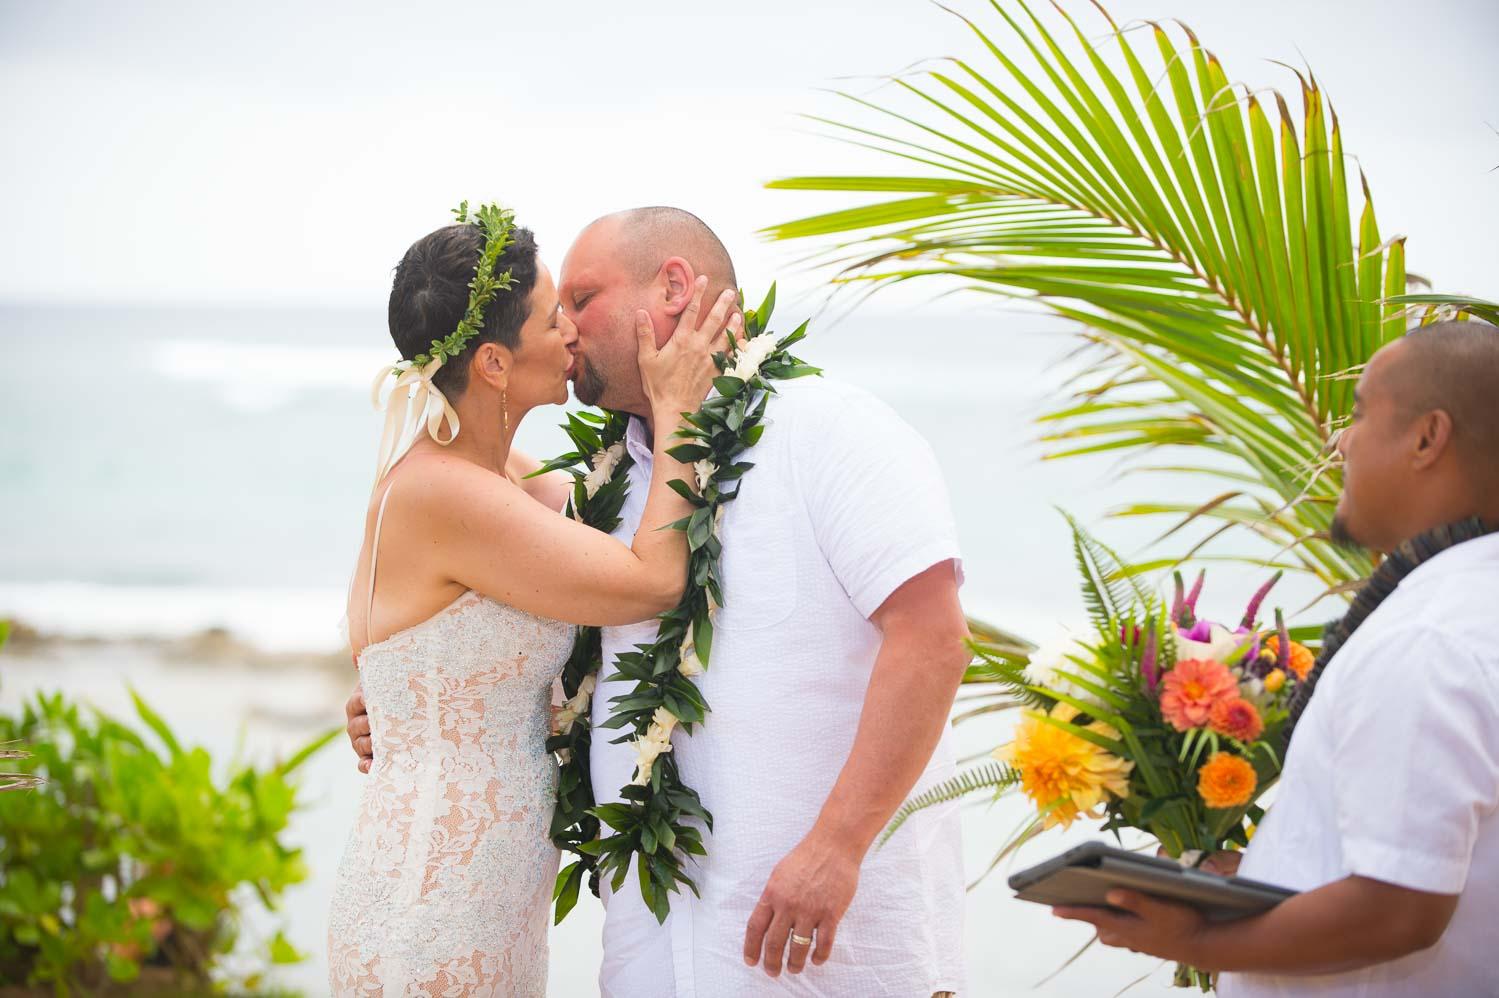 maui-wedding-photography-maui-wedding-venue-Tad-Craig-Photography-14.jpg